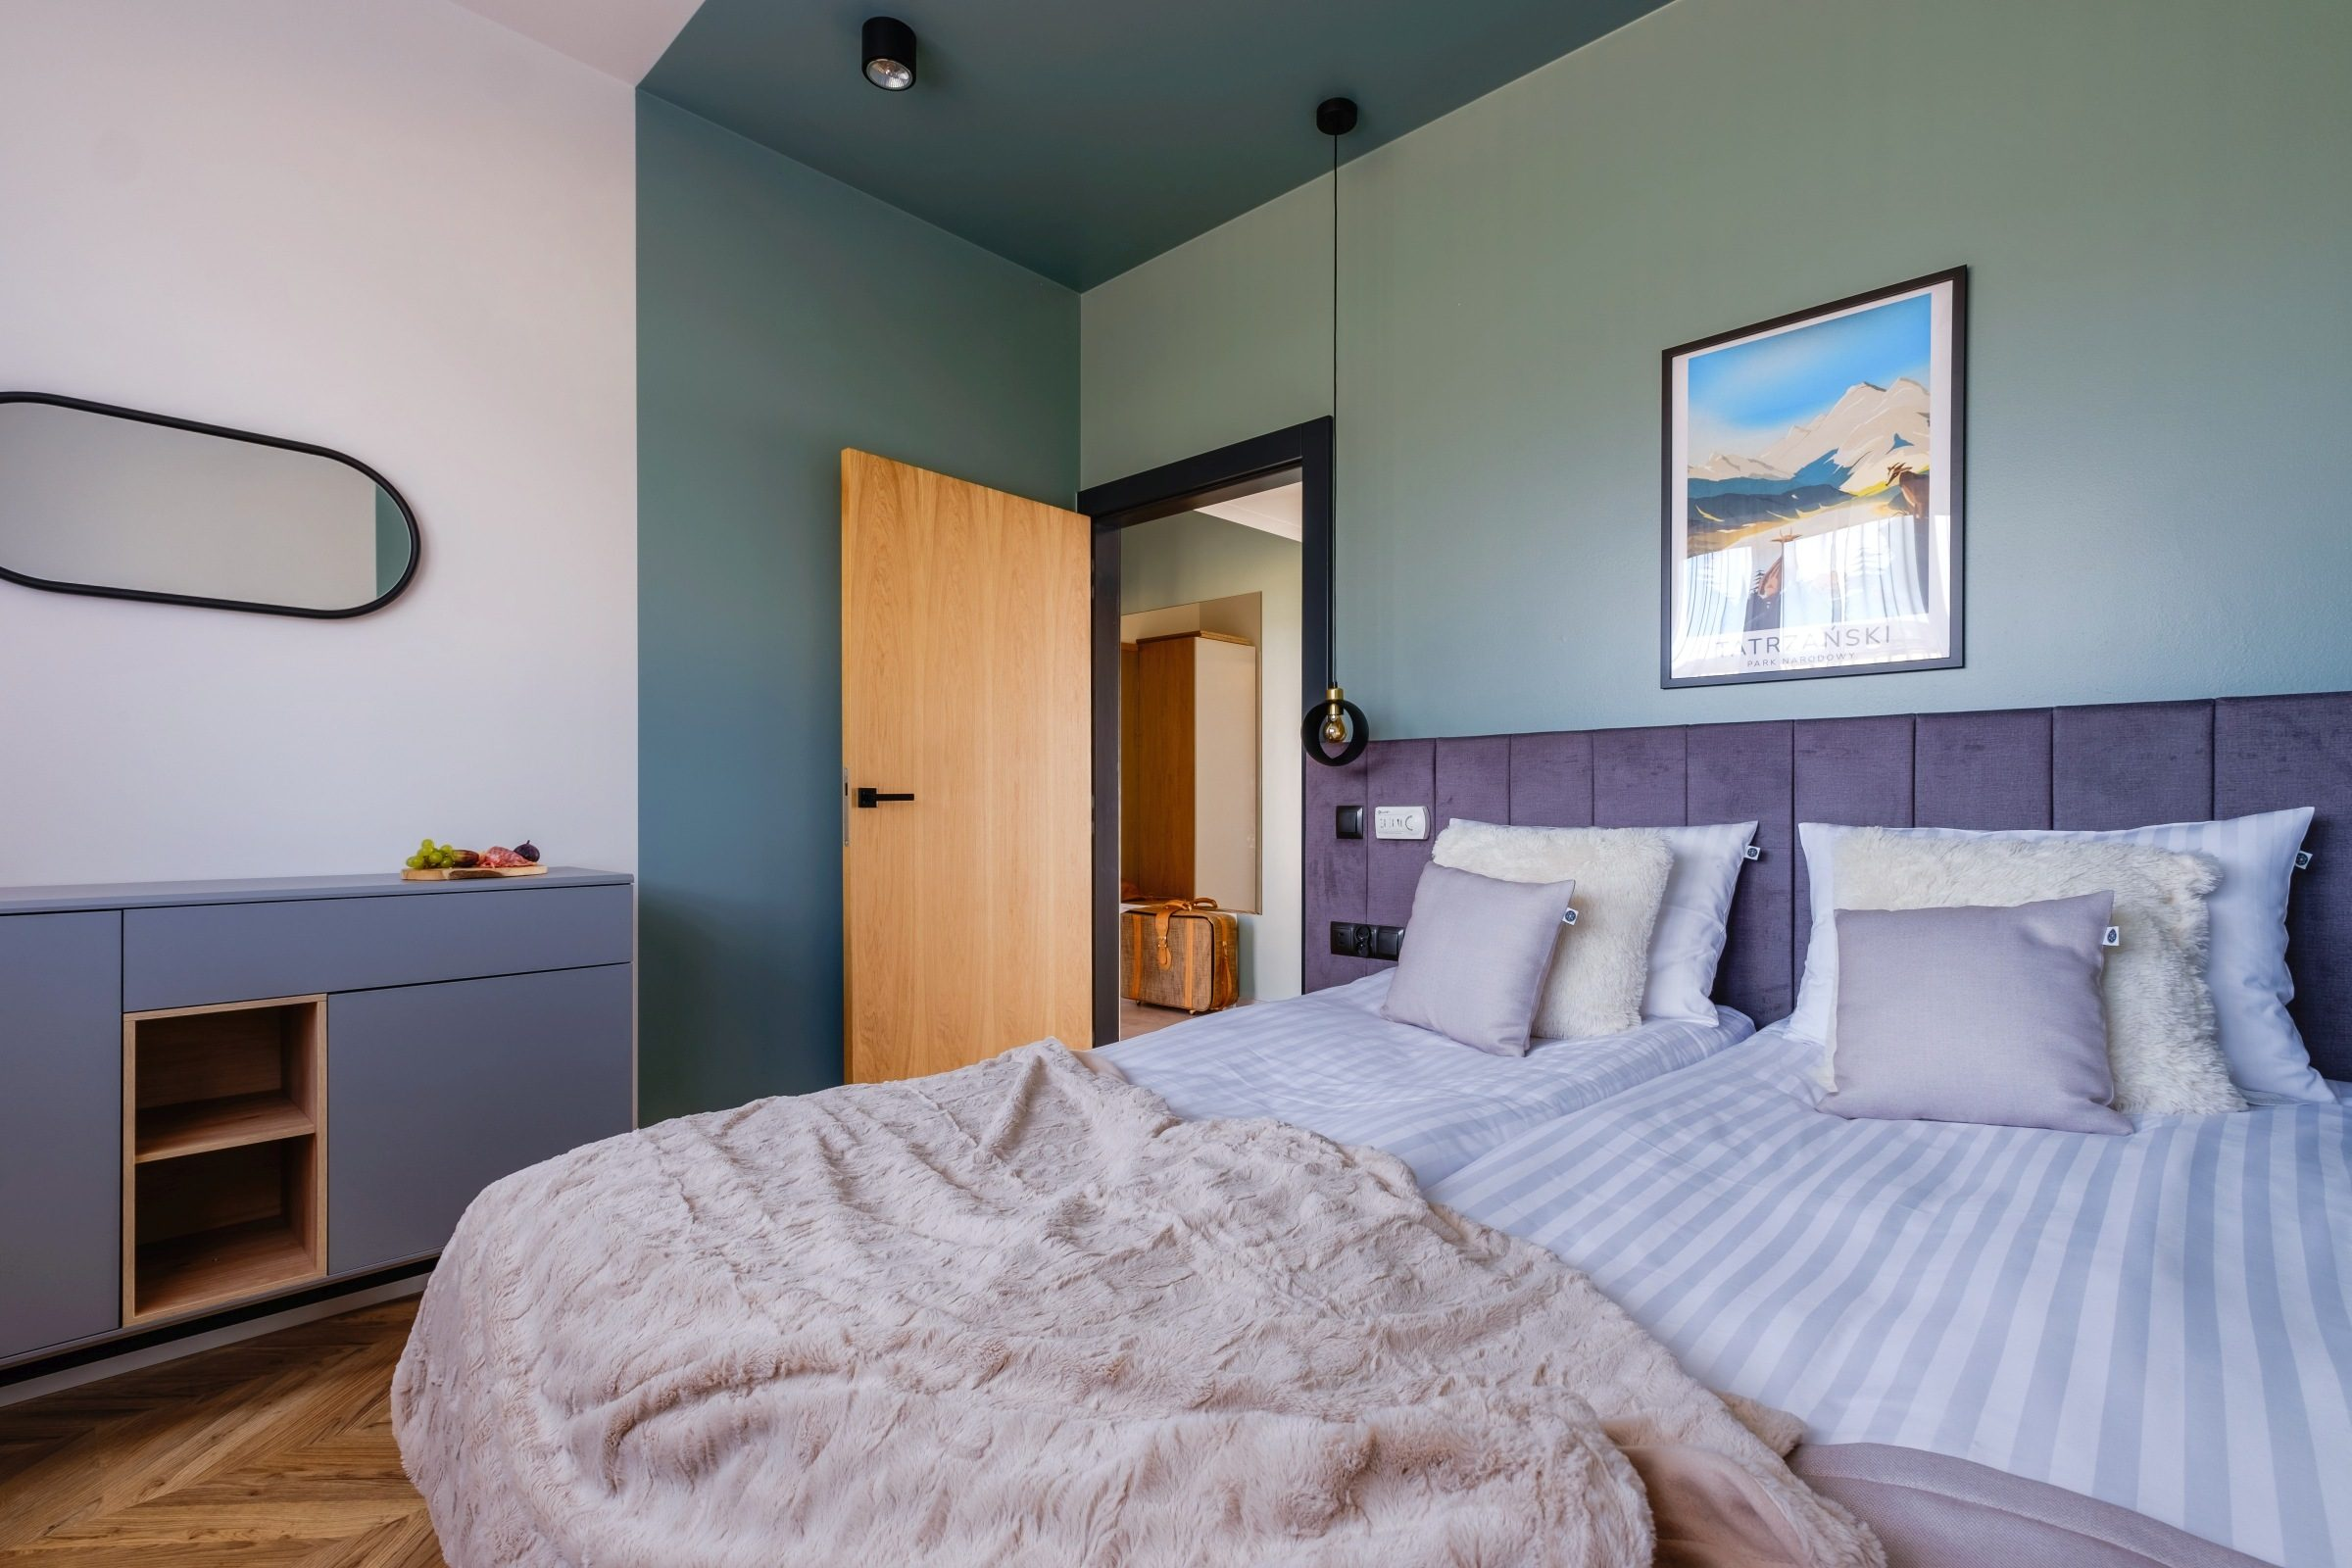 Apartamenty NOVA BIAŁKA Białka Tatrzańska apartament 7 sypialnia 4